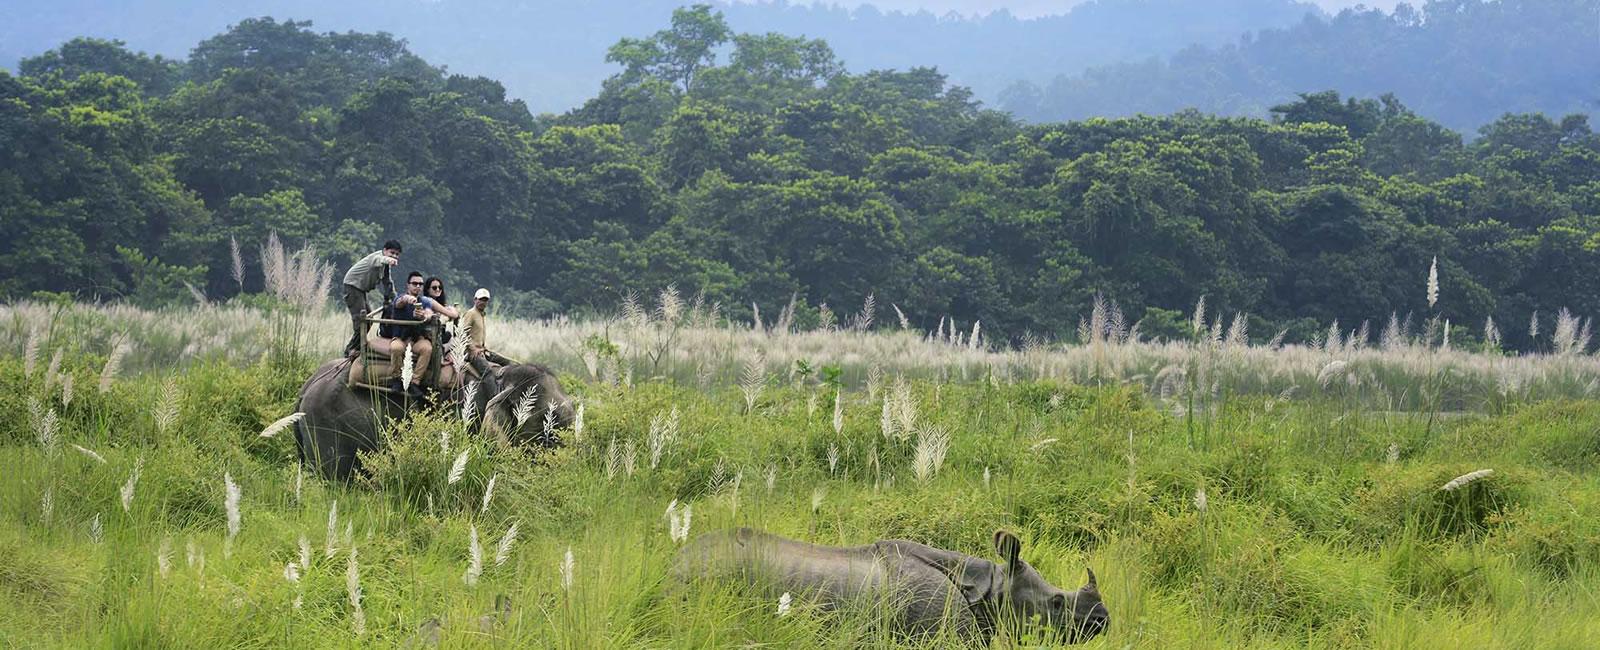 Chitwan National Park Jungle Safari Tour